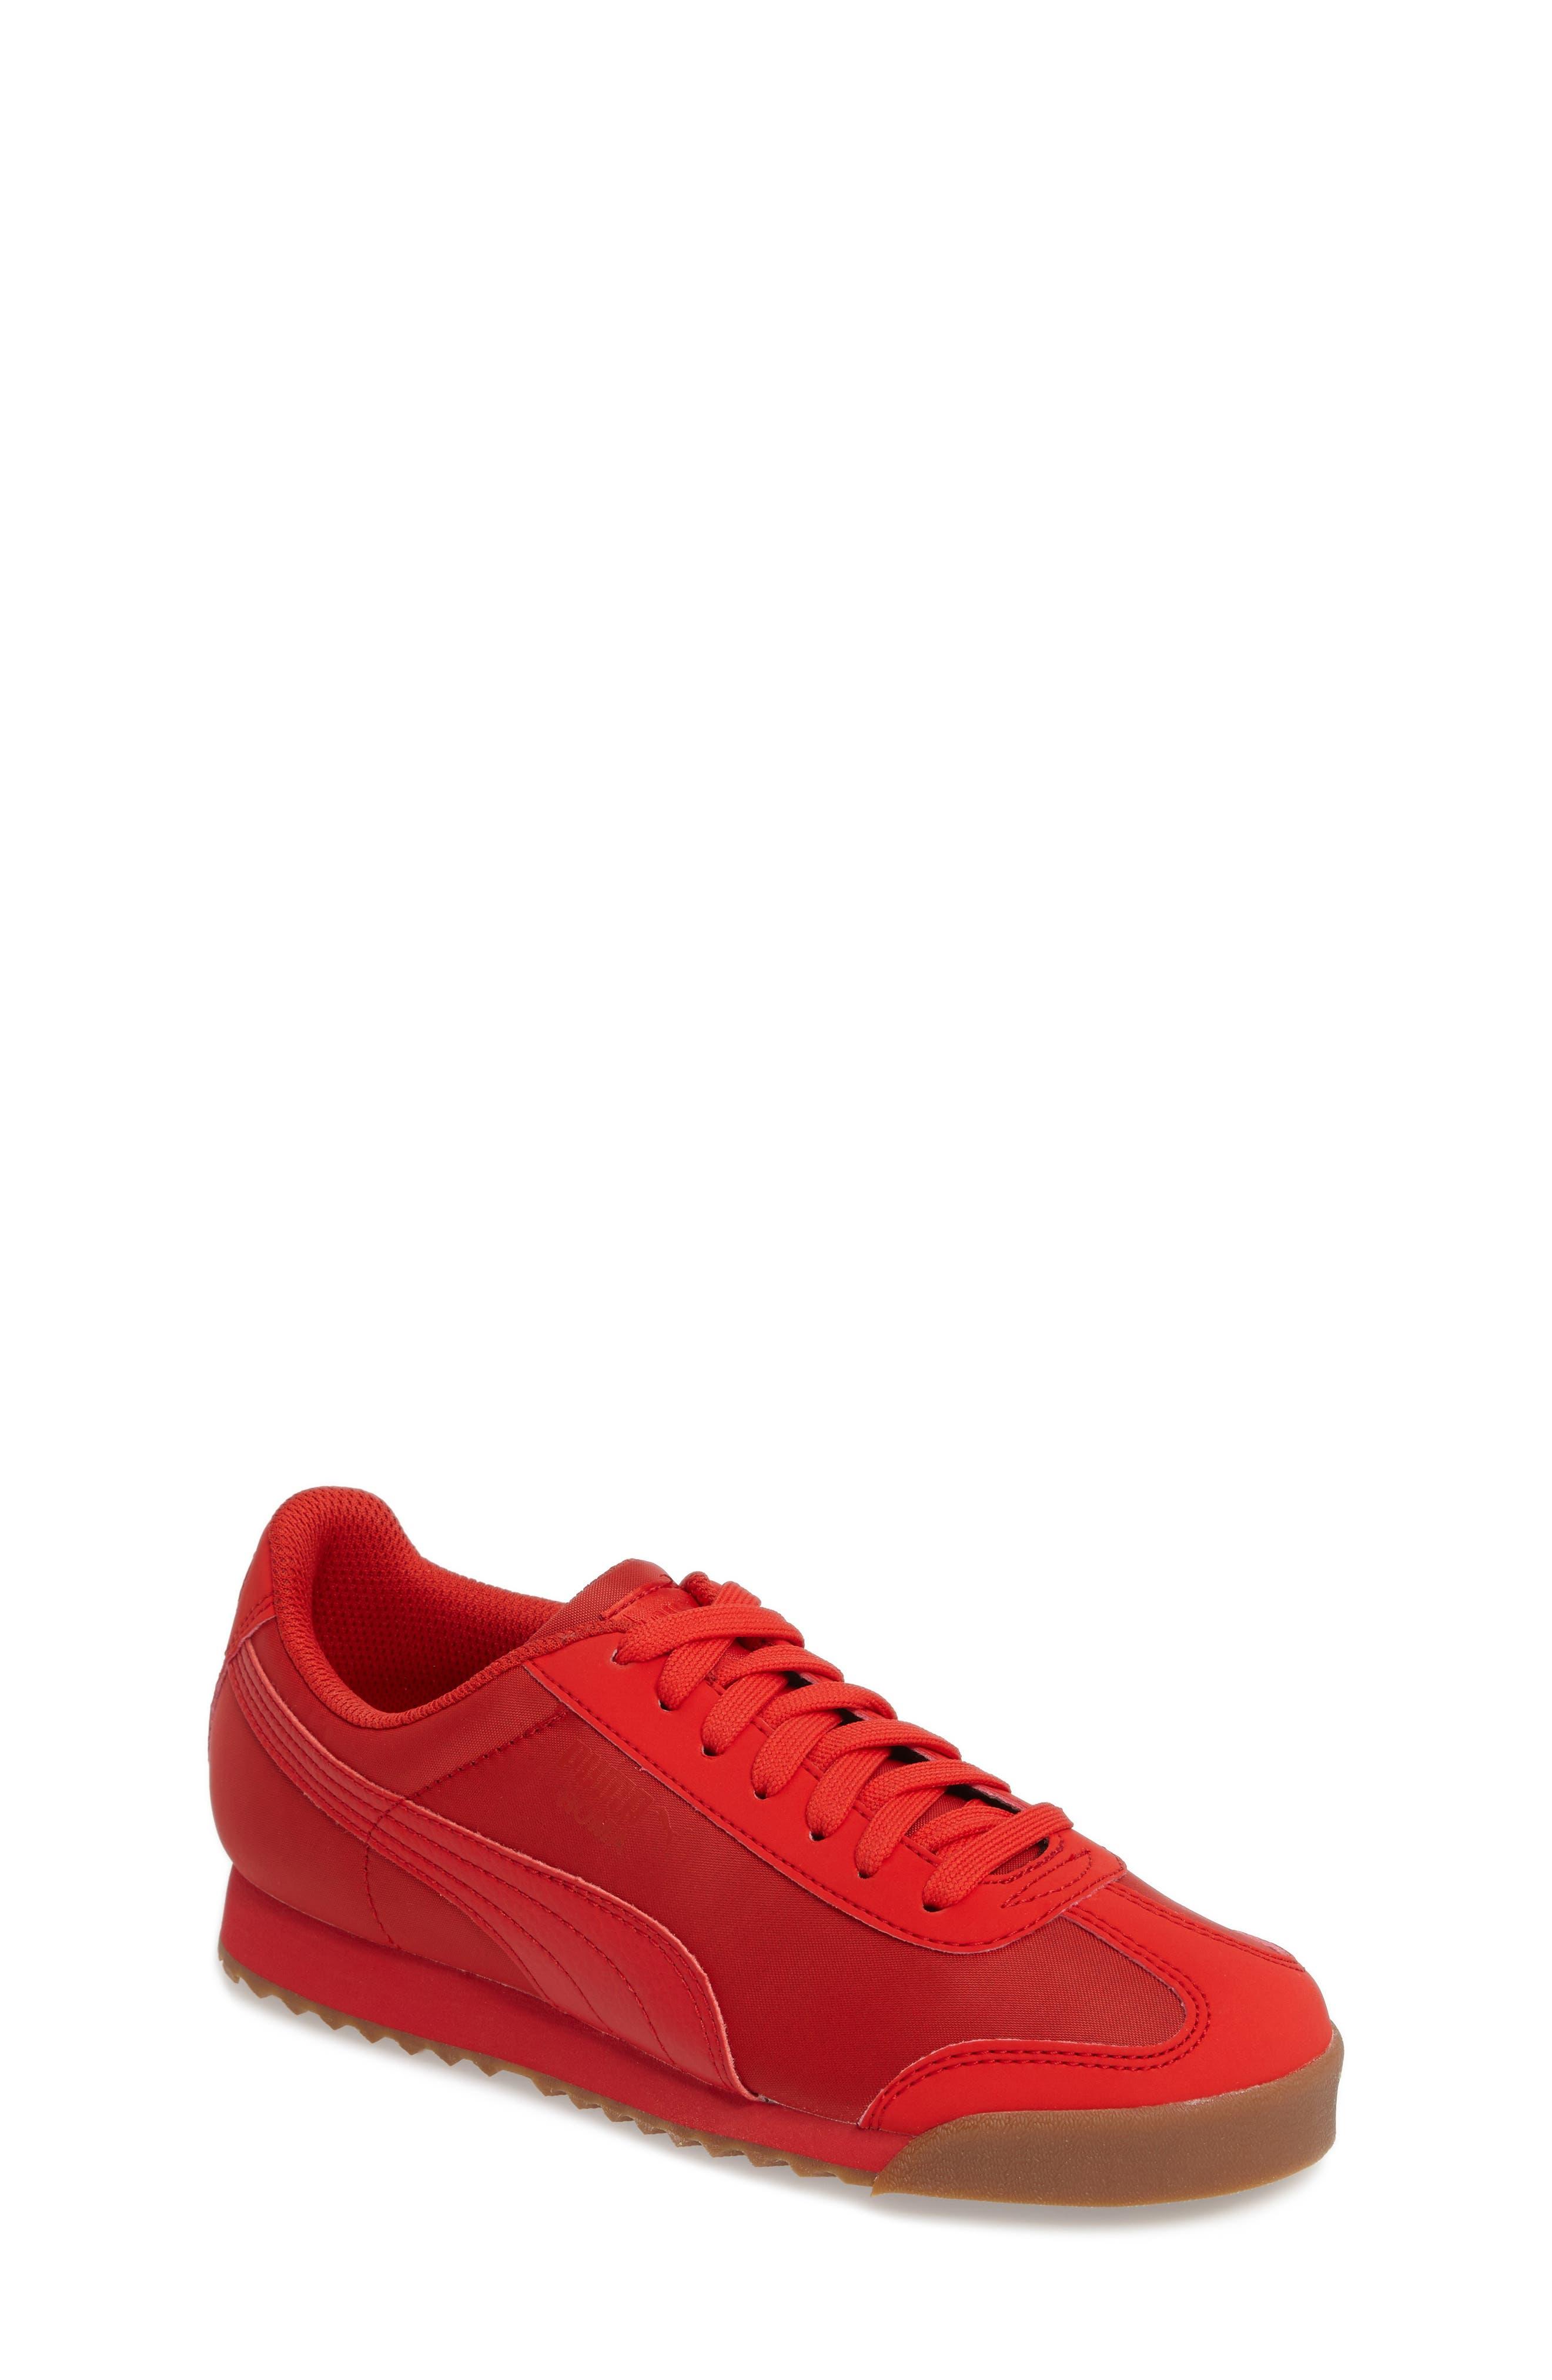 Roma Basic Summer Sneaker,                             Main thumbnail 1, color,                             High Risk Red